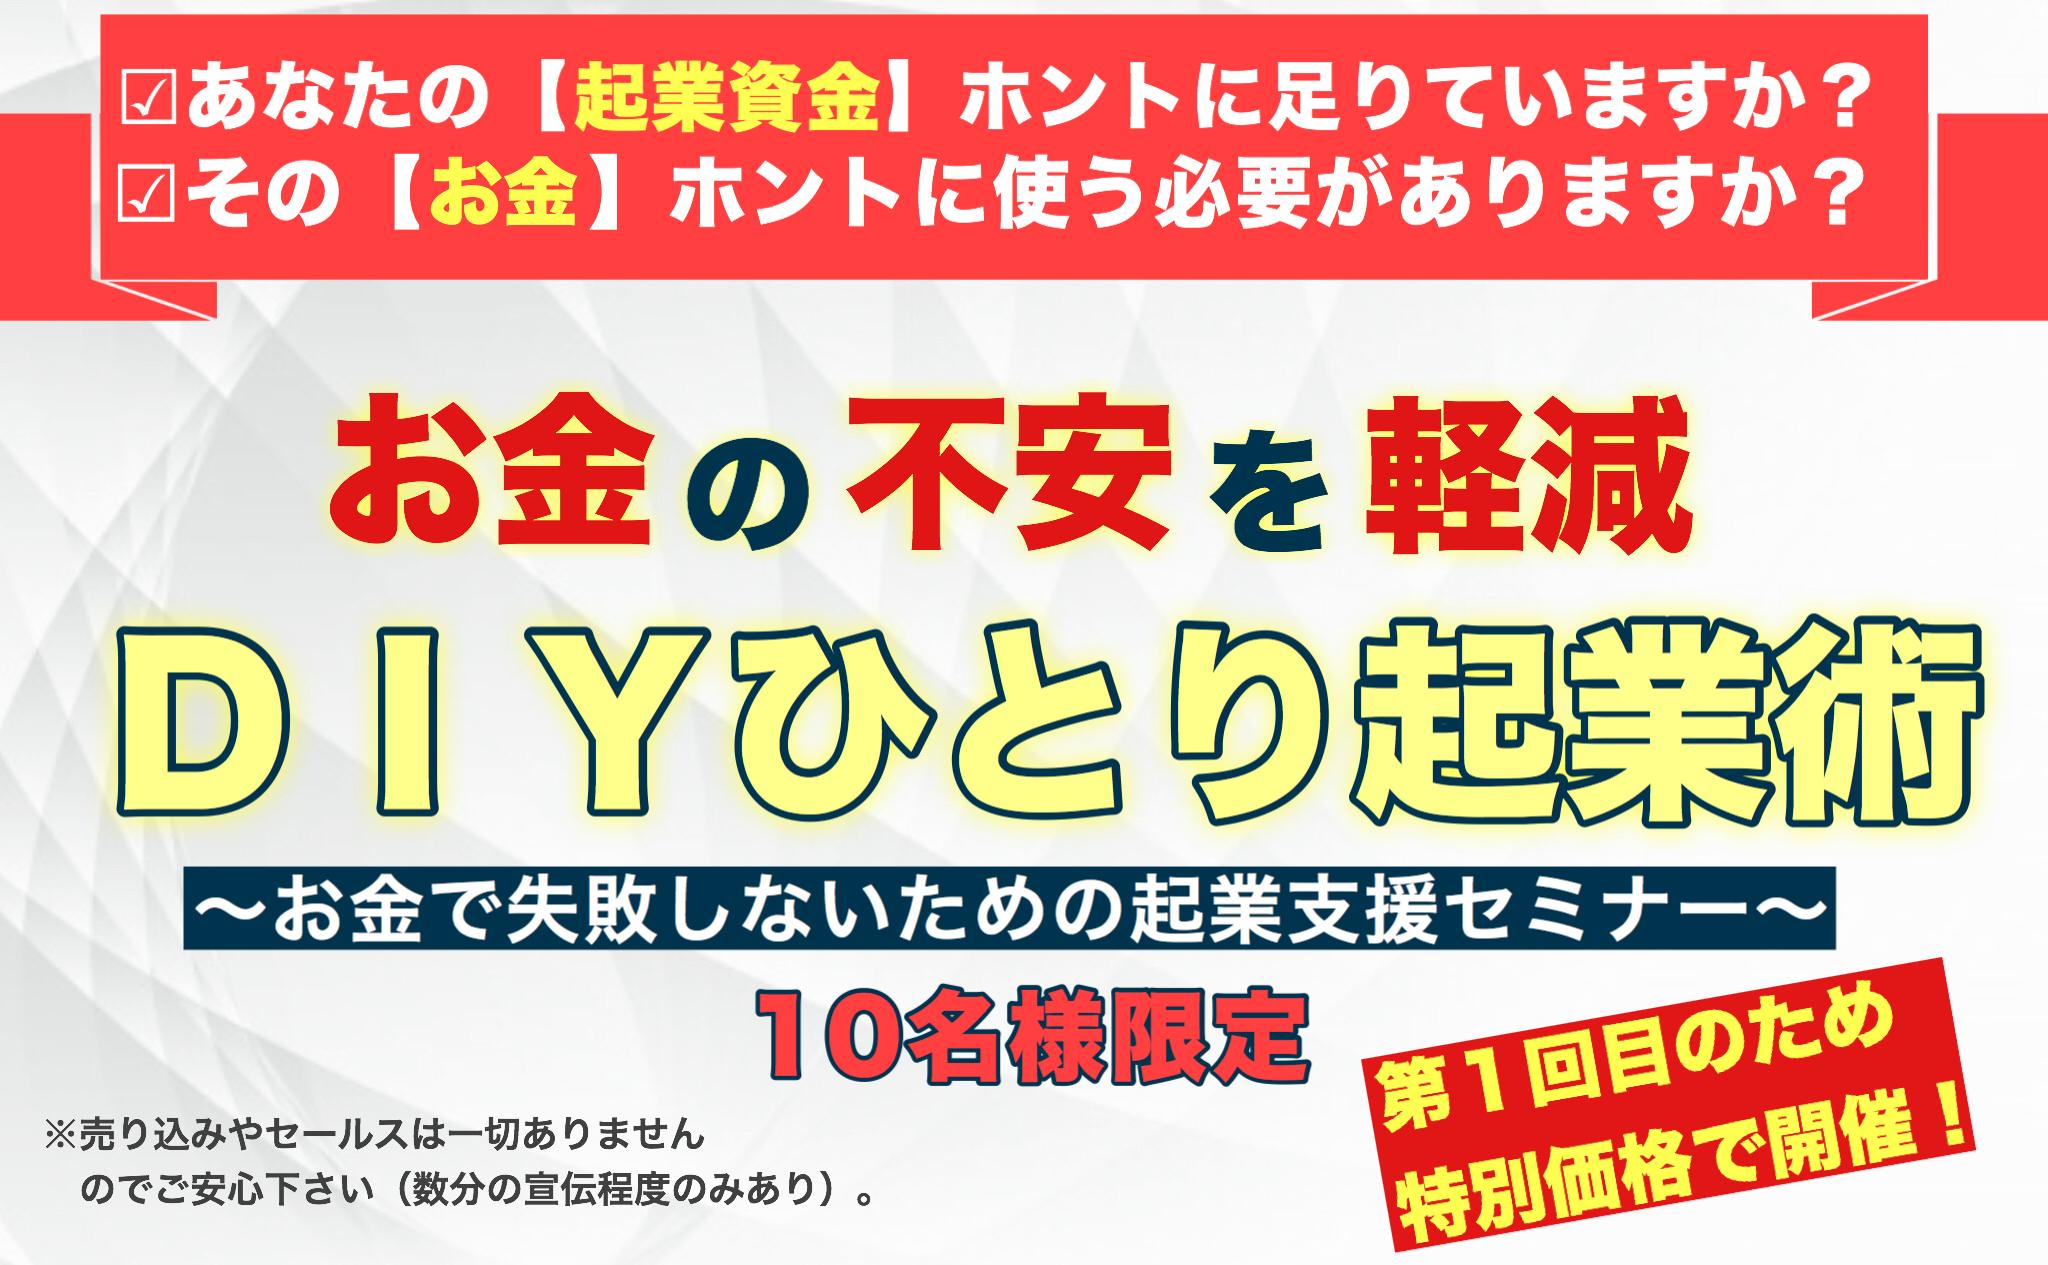 個人事業主の起業開業資金調達・助成金・融資・支援セミナー東京開催ヘッダー